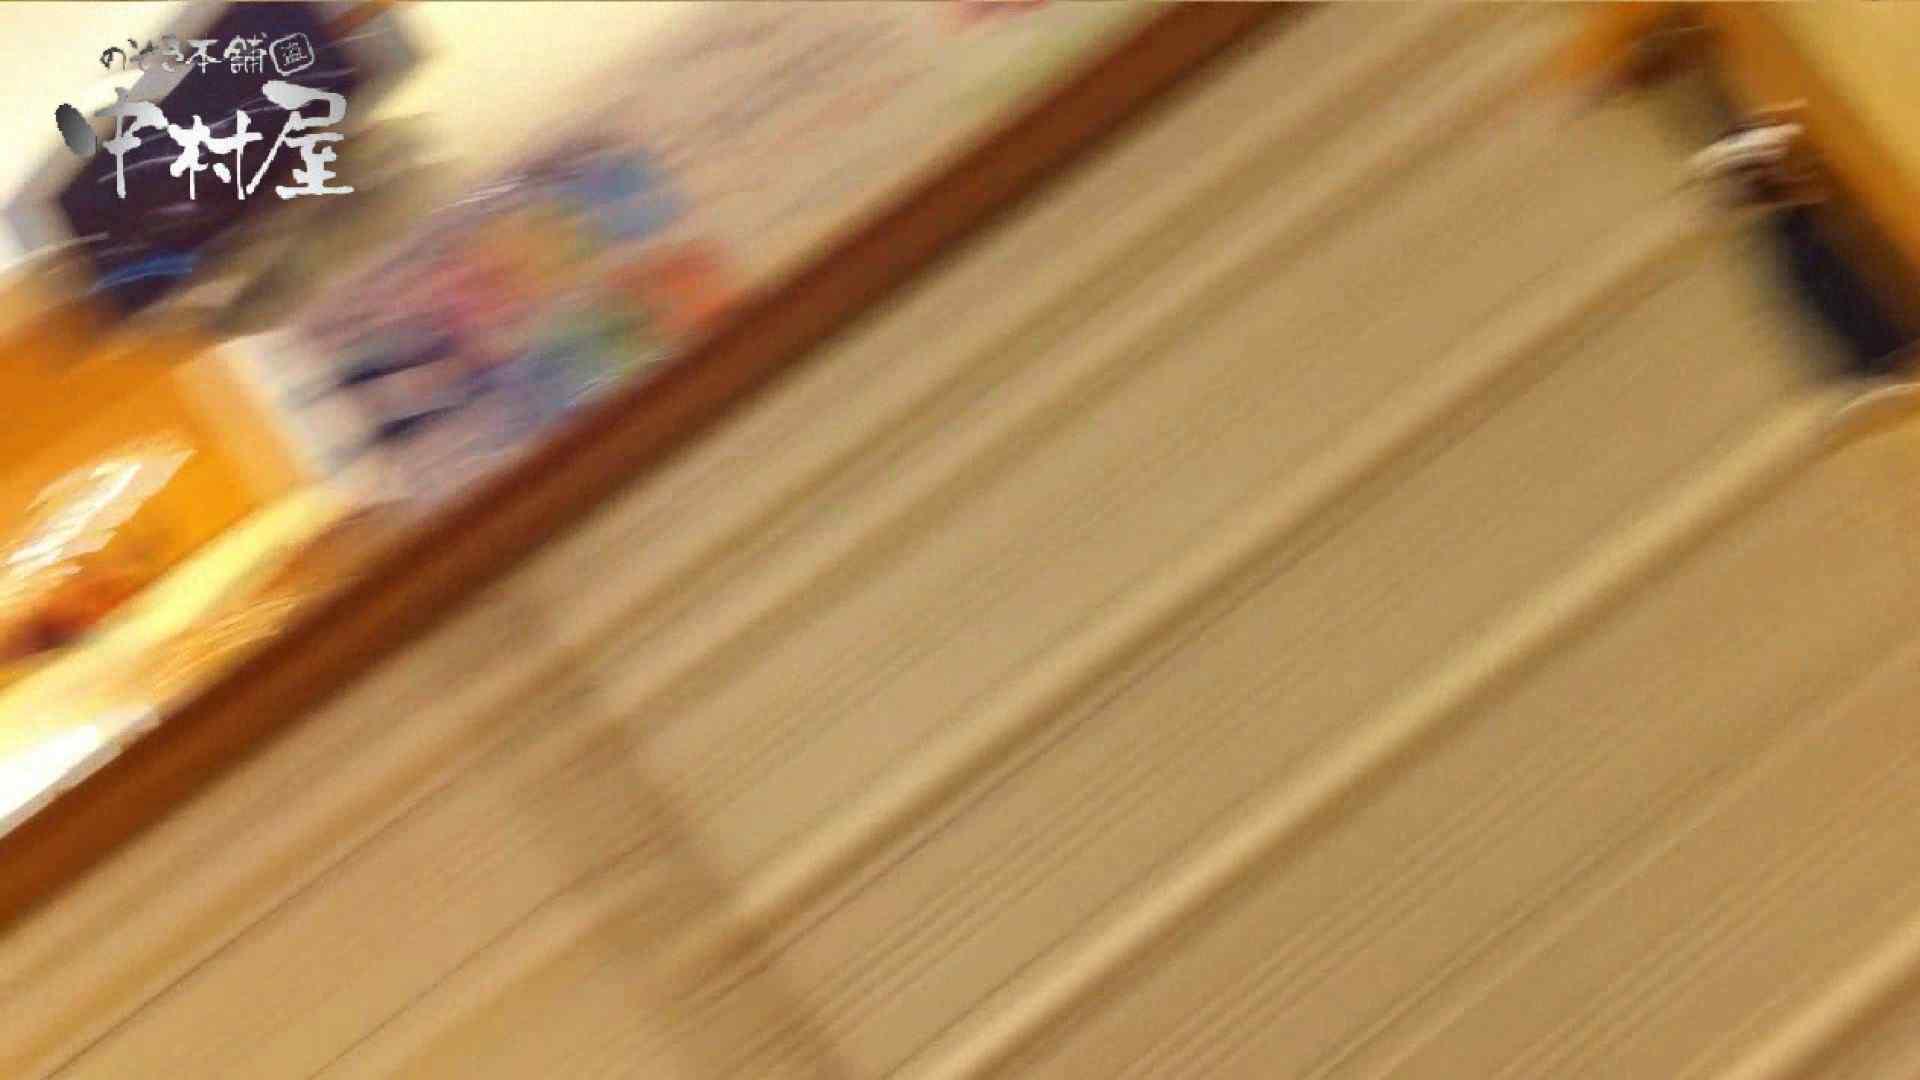 vol.65 美人アパレル胸チラ&パンチラ ムッチリ感がいい感じ花がらパンツさん チラ  106連発 32